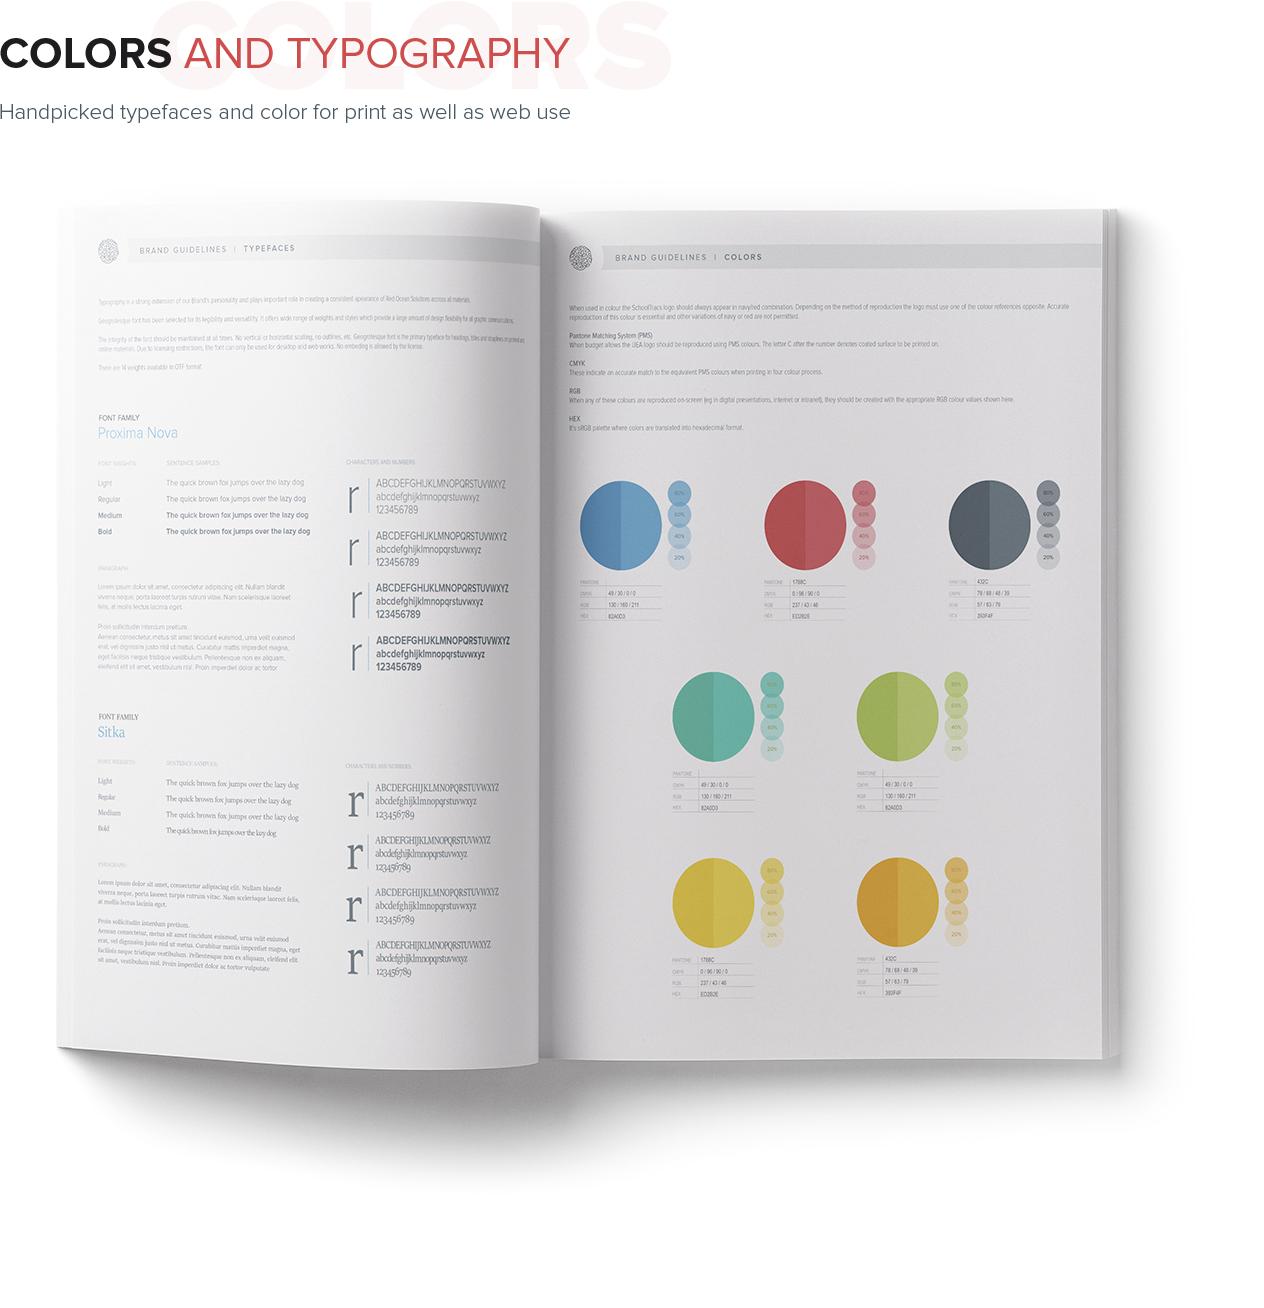 https://media.authentic-studio.com/web-content/uploads/2020/11/colors-and-typography-for-product-design-hermes-recherche.jpg